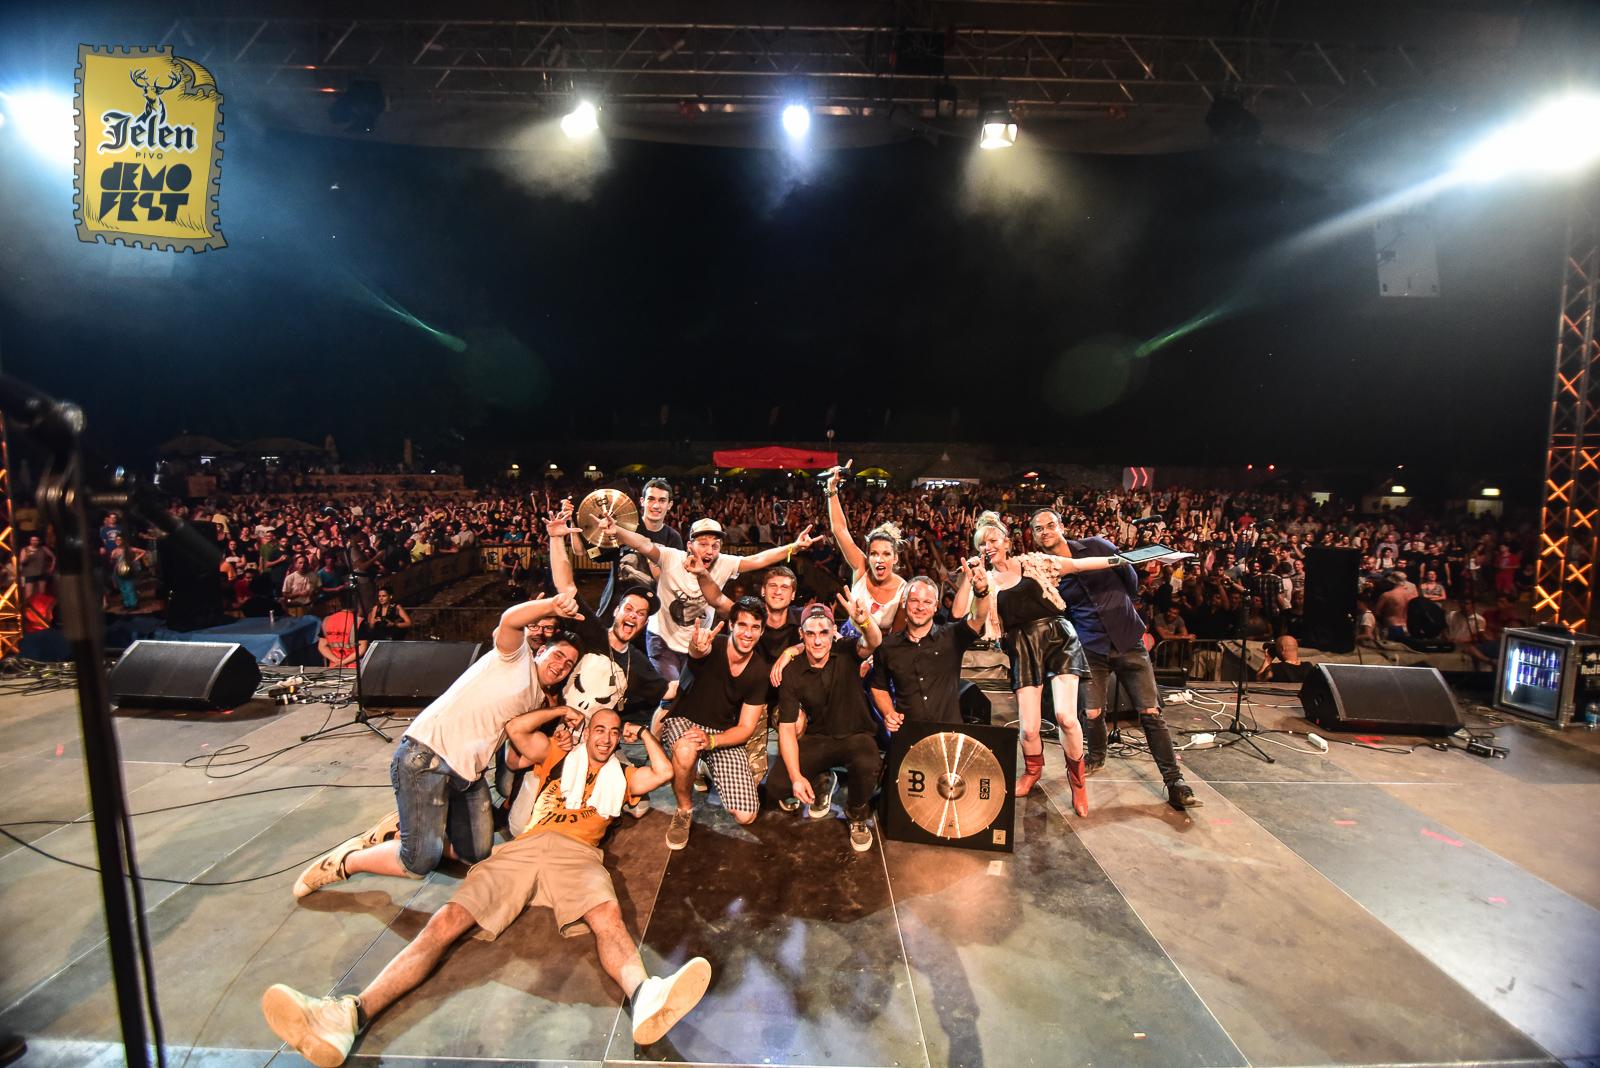 Jelen Demofest 2015